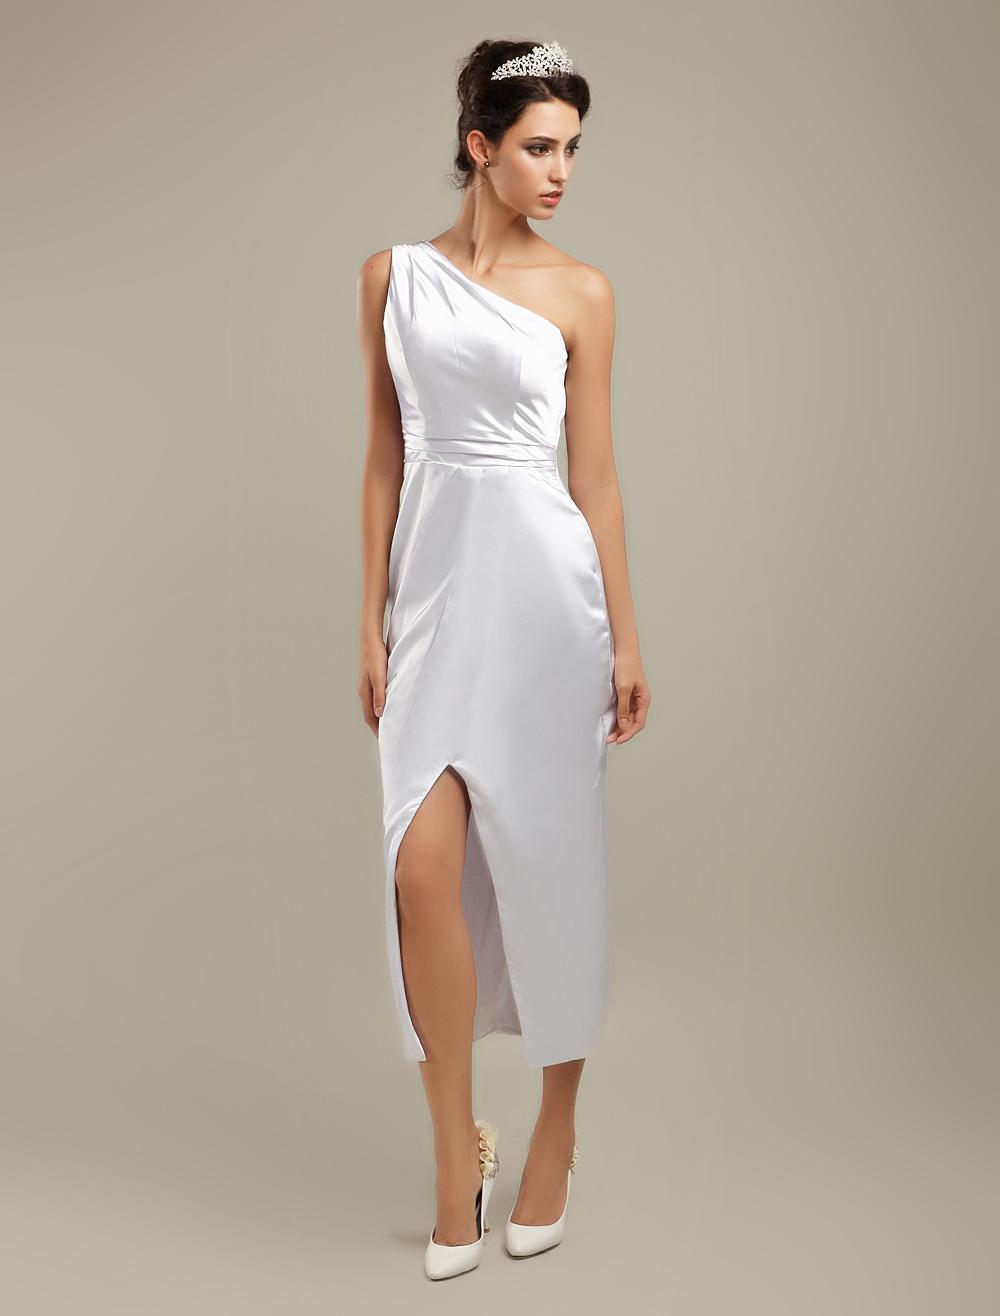 Ivory Elastic Woven Satin Dresses